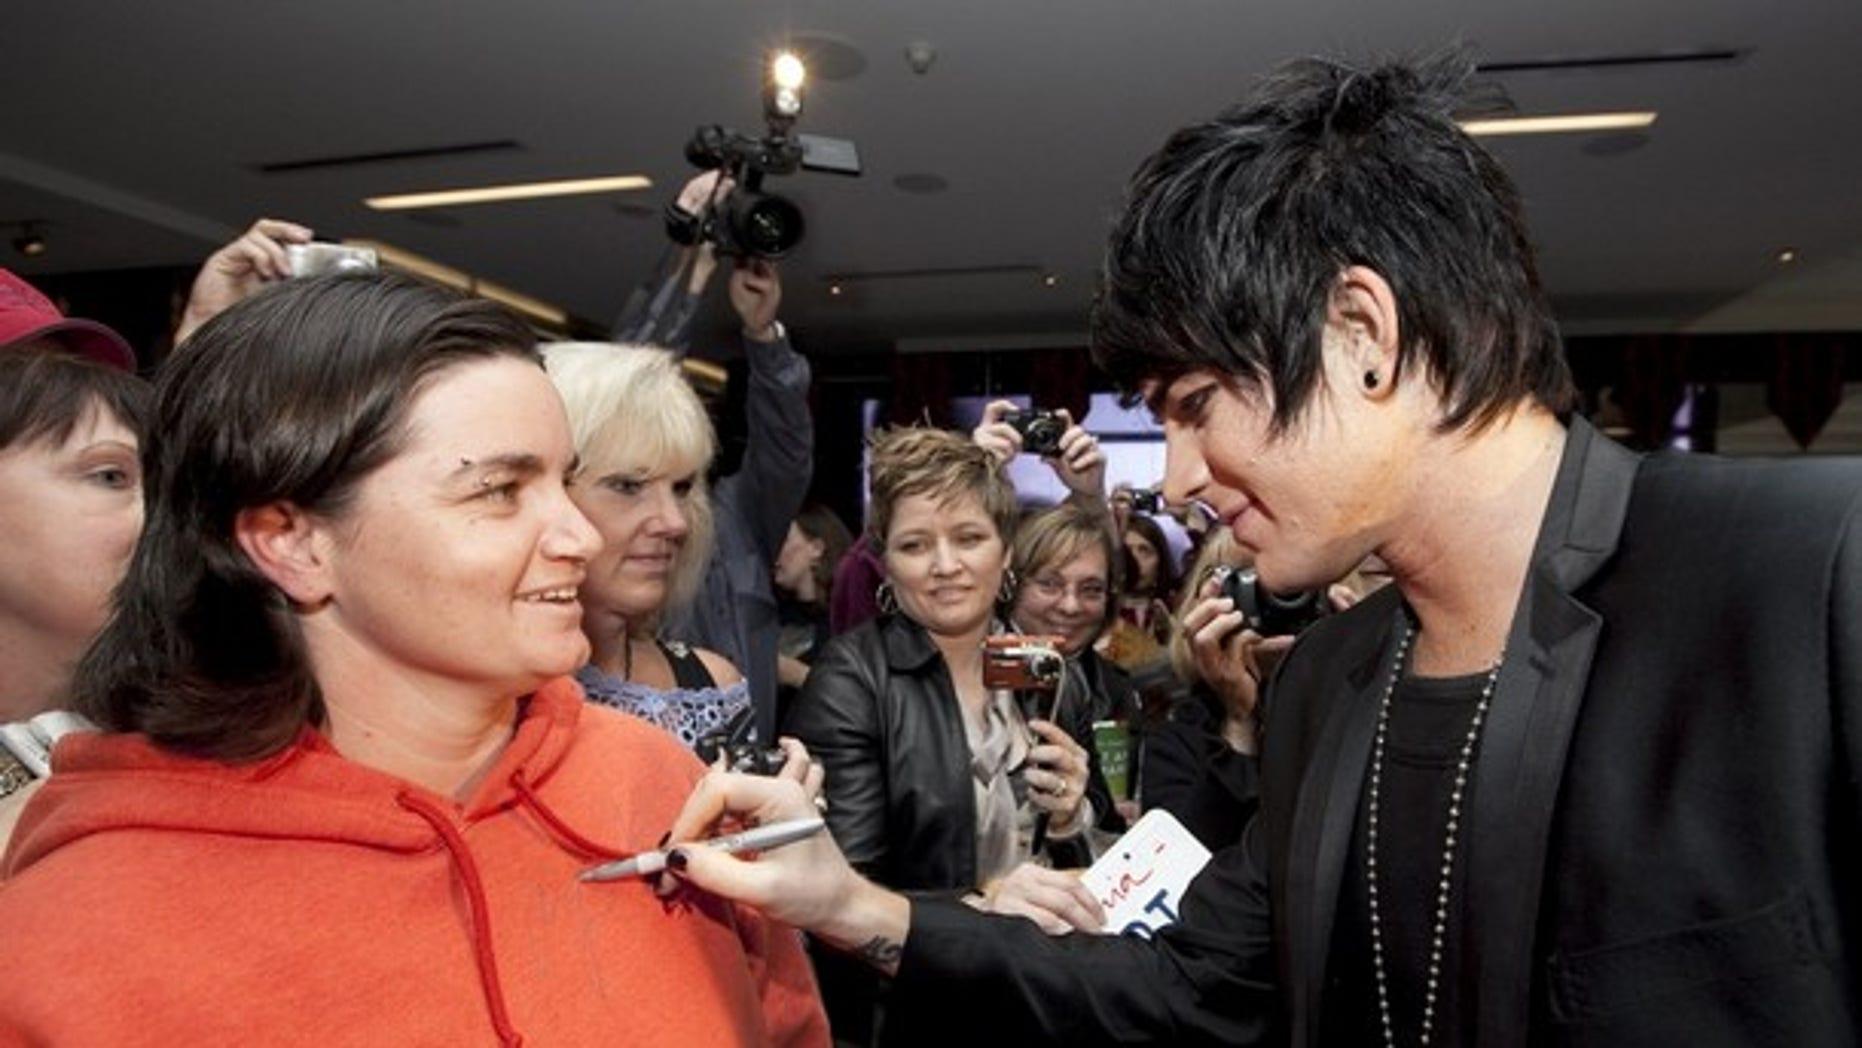 Singer Adam Lambert autographs a fan's sweatshirt.